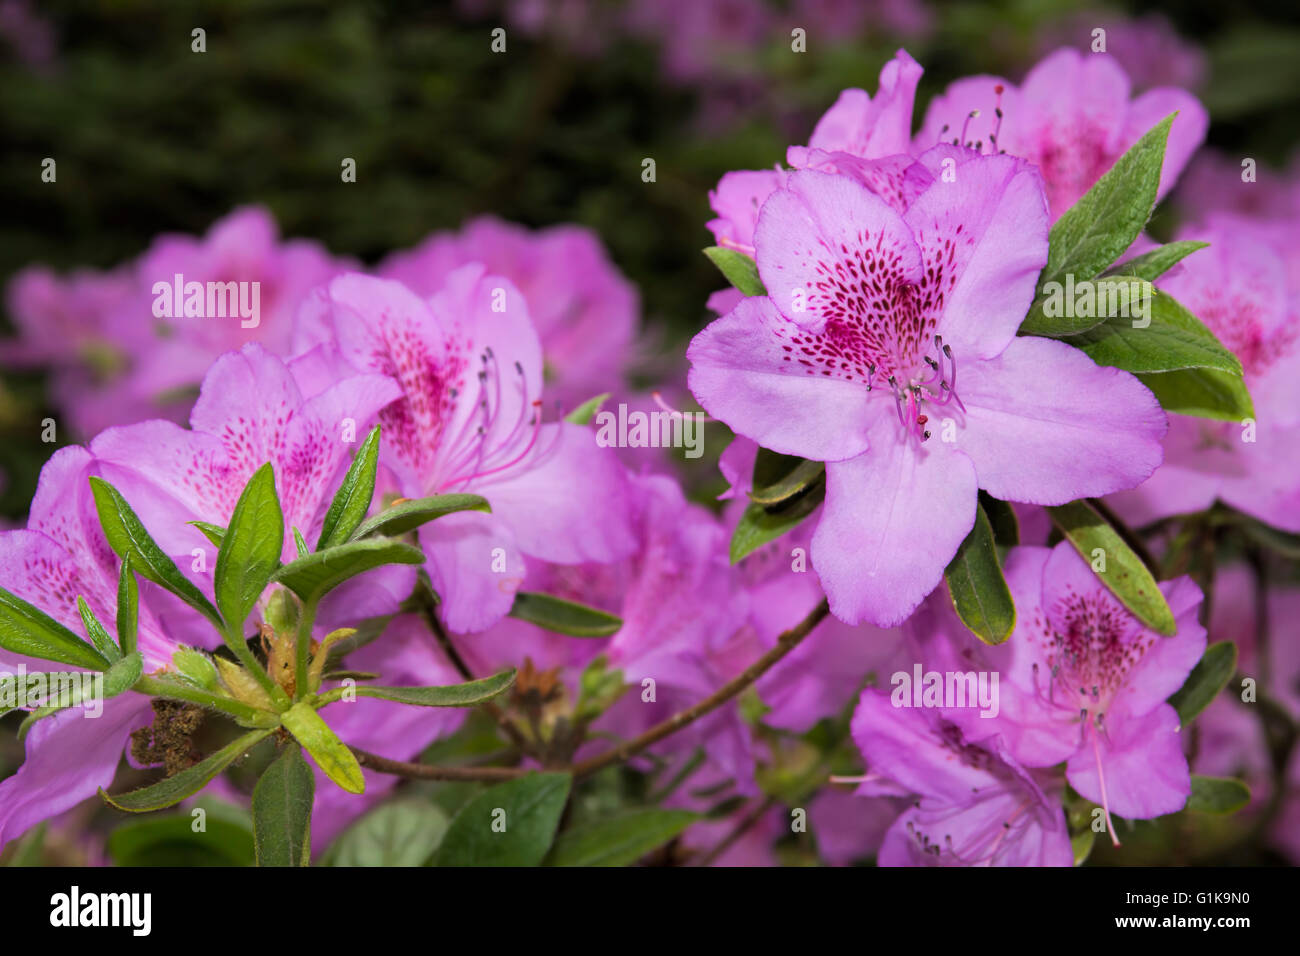 Azalea, Formosa Azalea - Stock Image